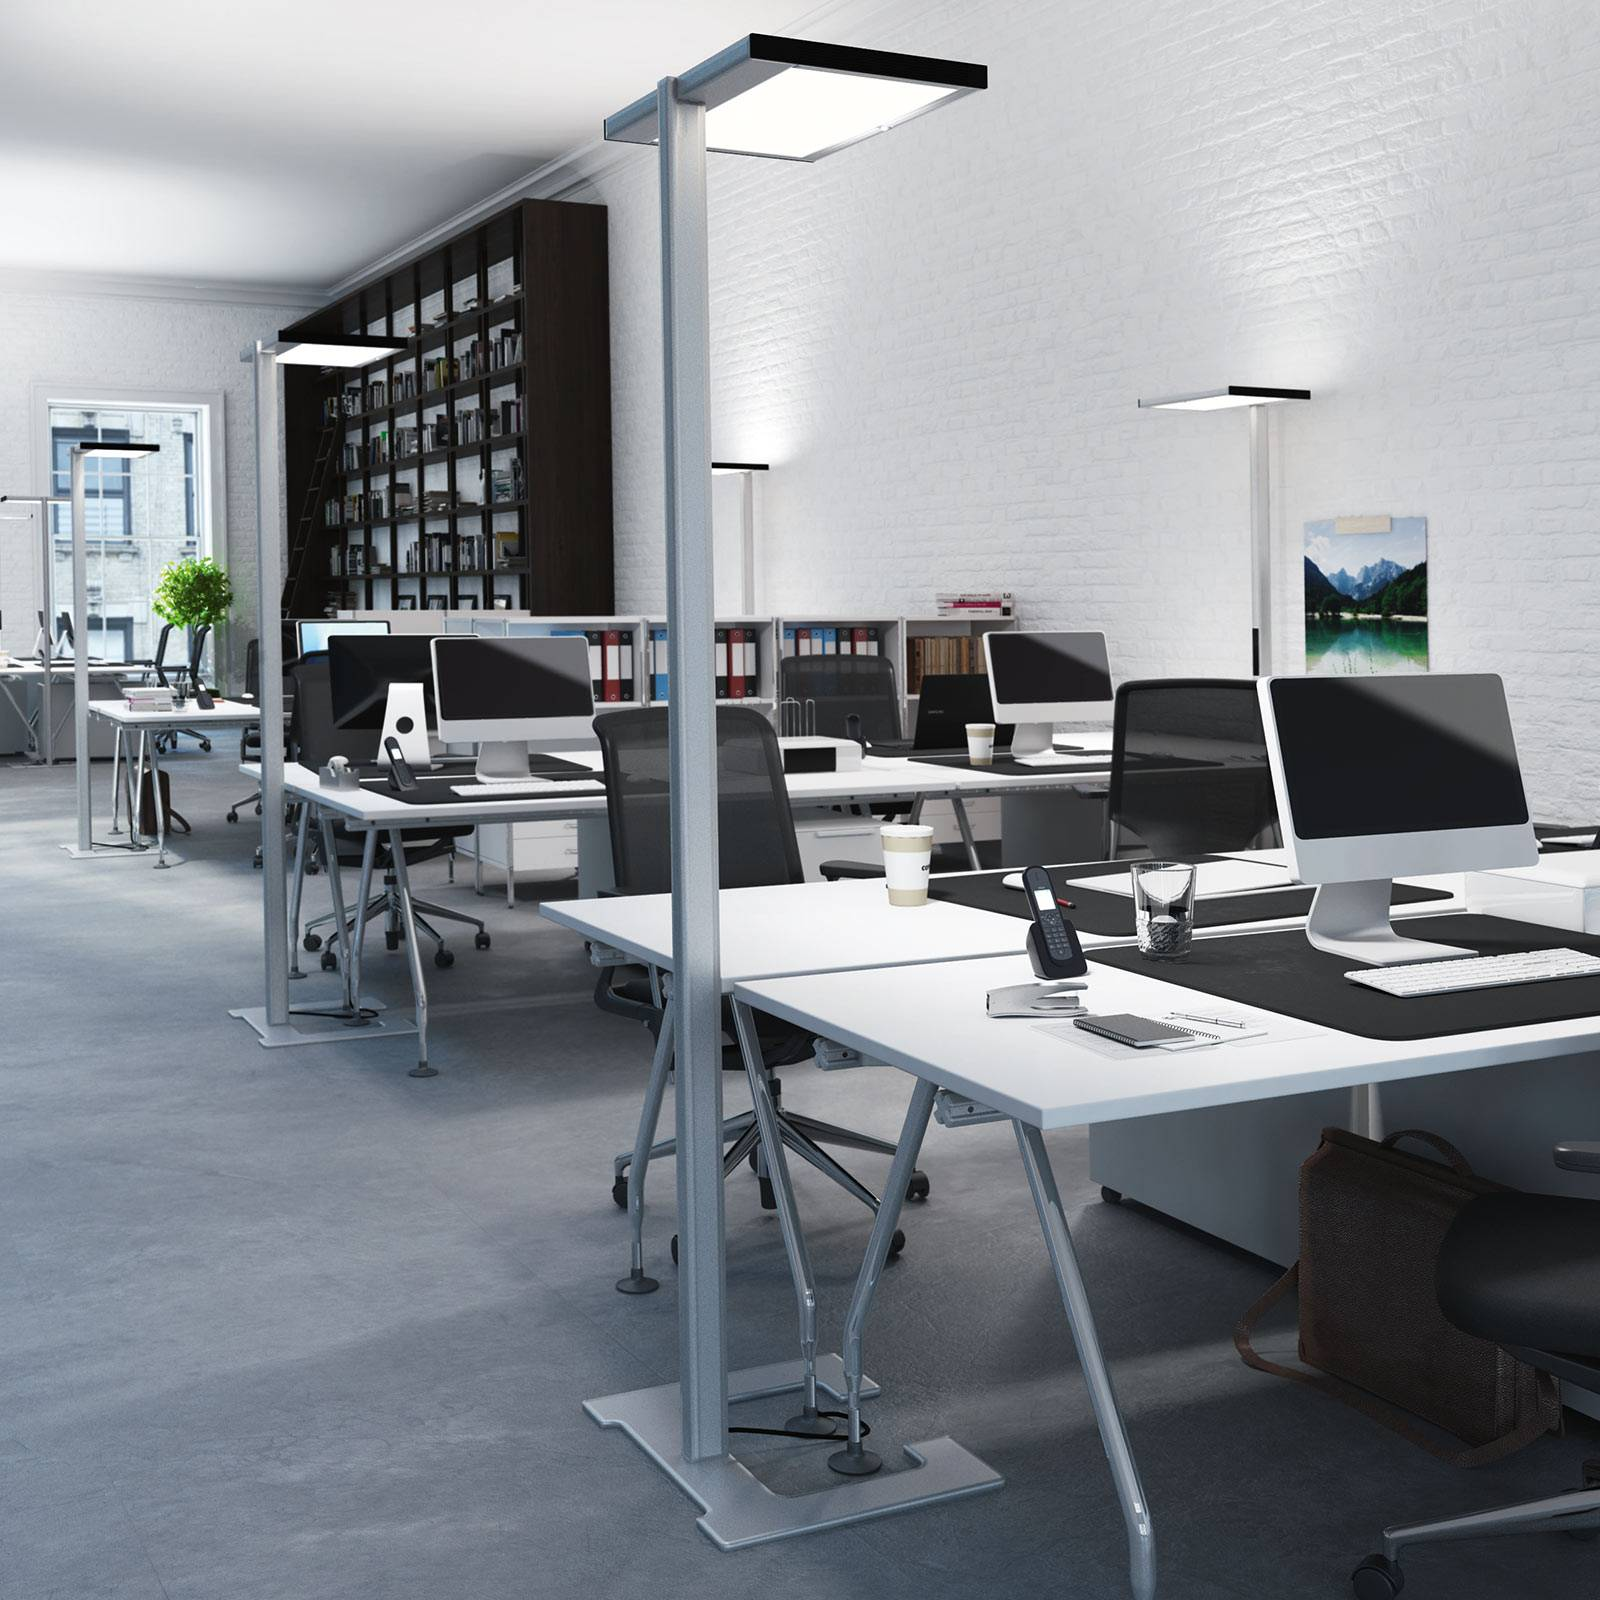 Luctra Vitawork LED-toimistolattiavalo 12000 lm